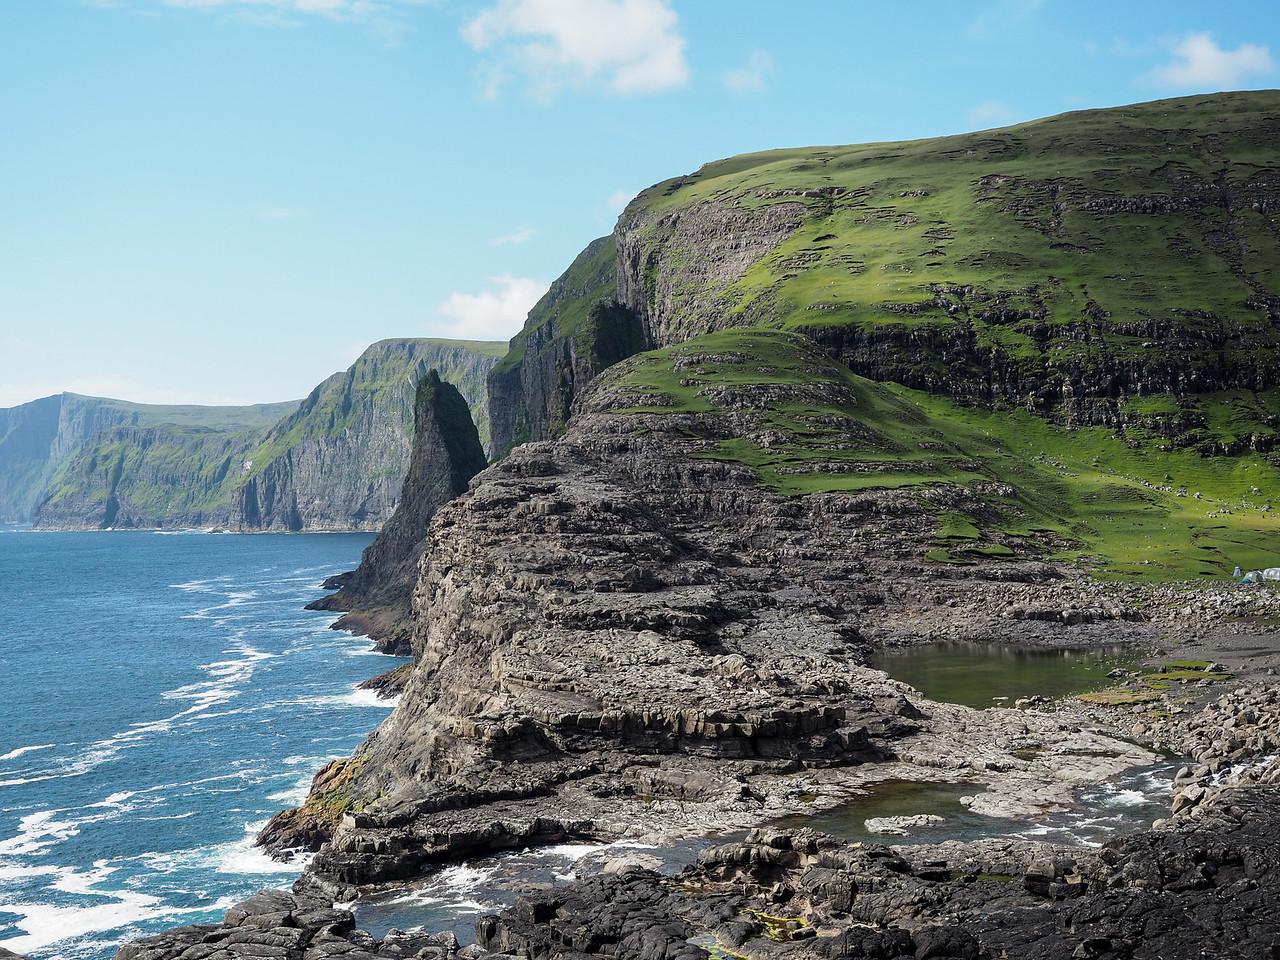 Faroe Islands coastline